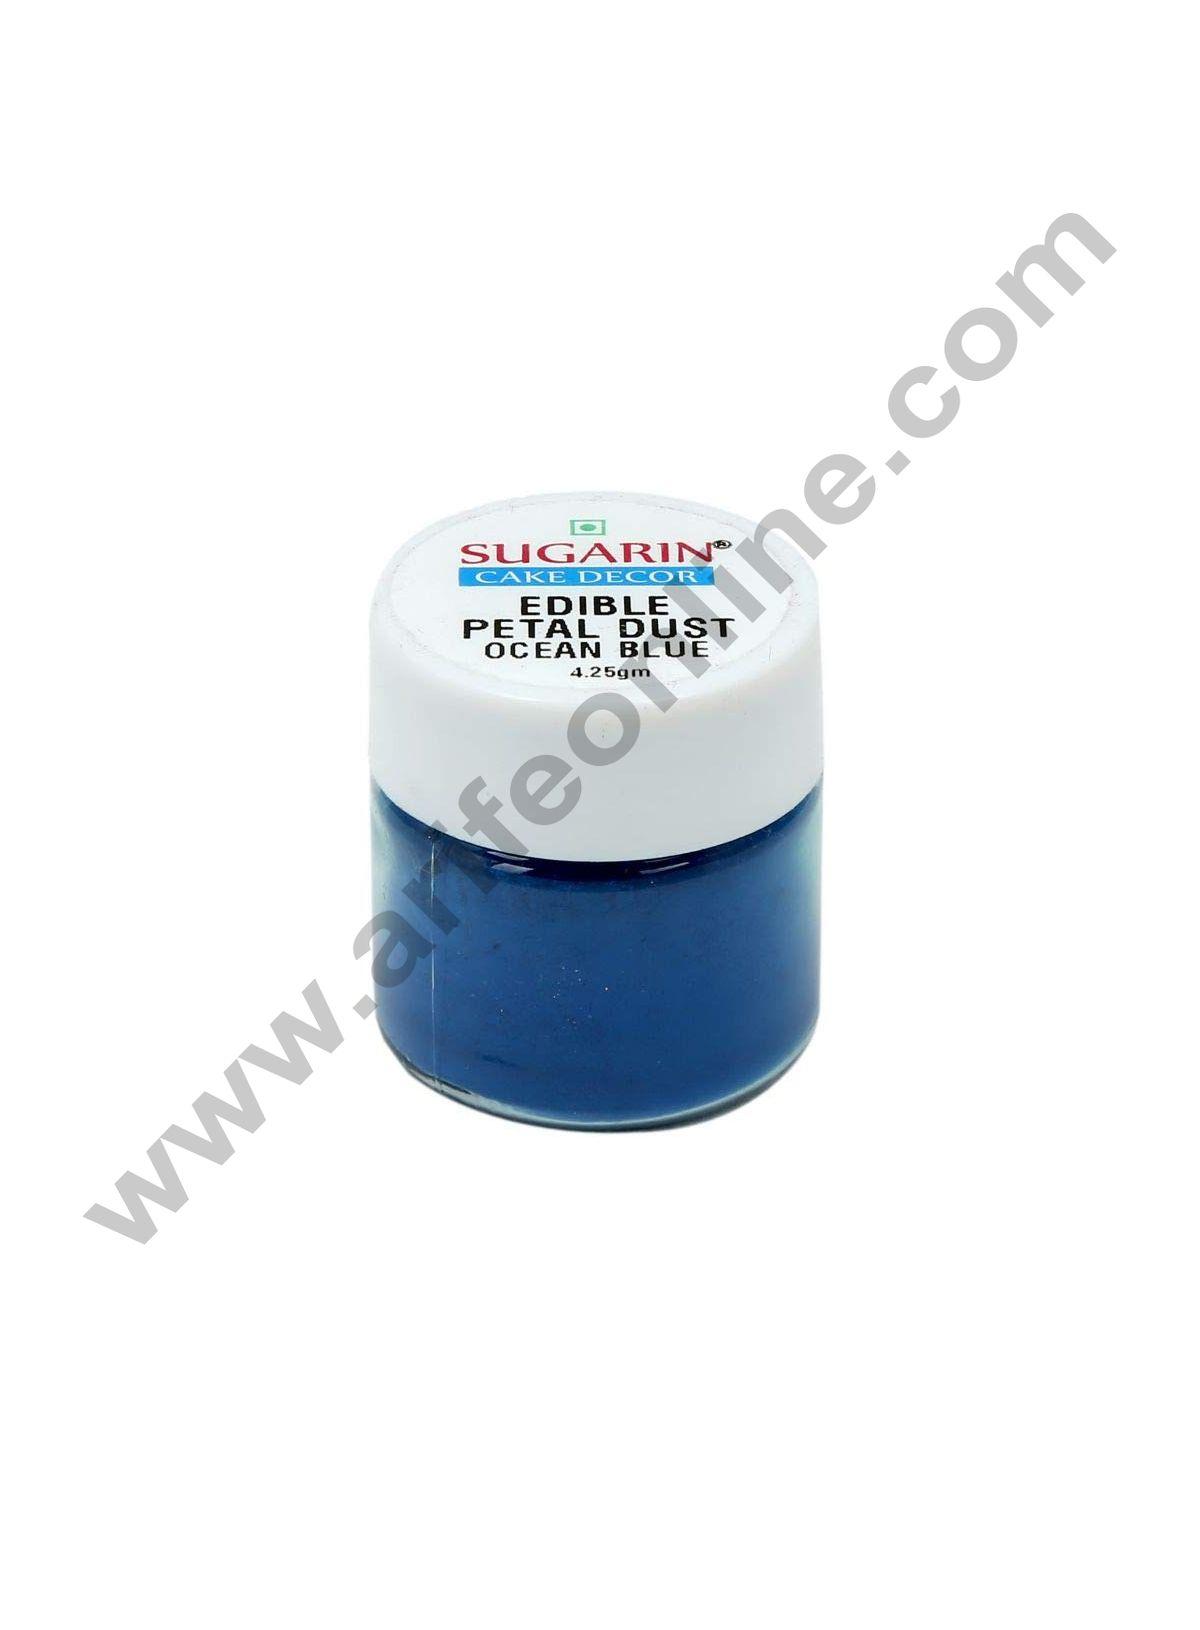 Sugarin Edible Petal Dust, Ocean Blue, 4.25gm